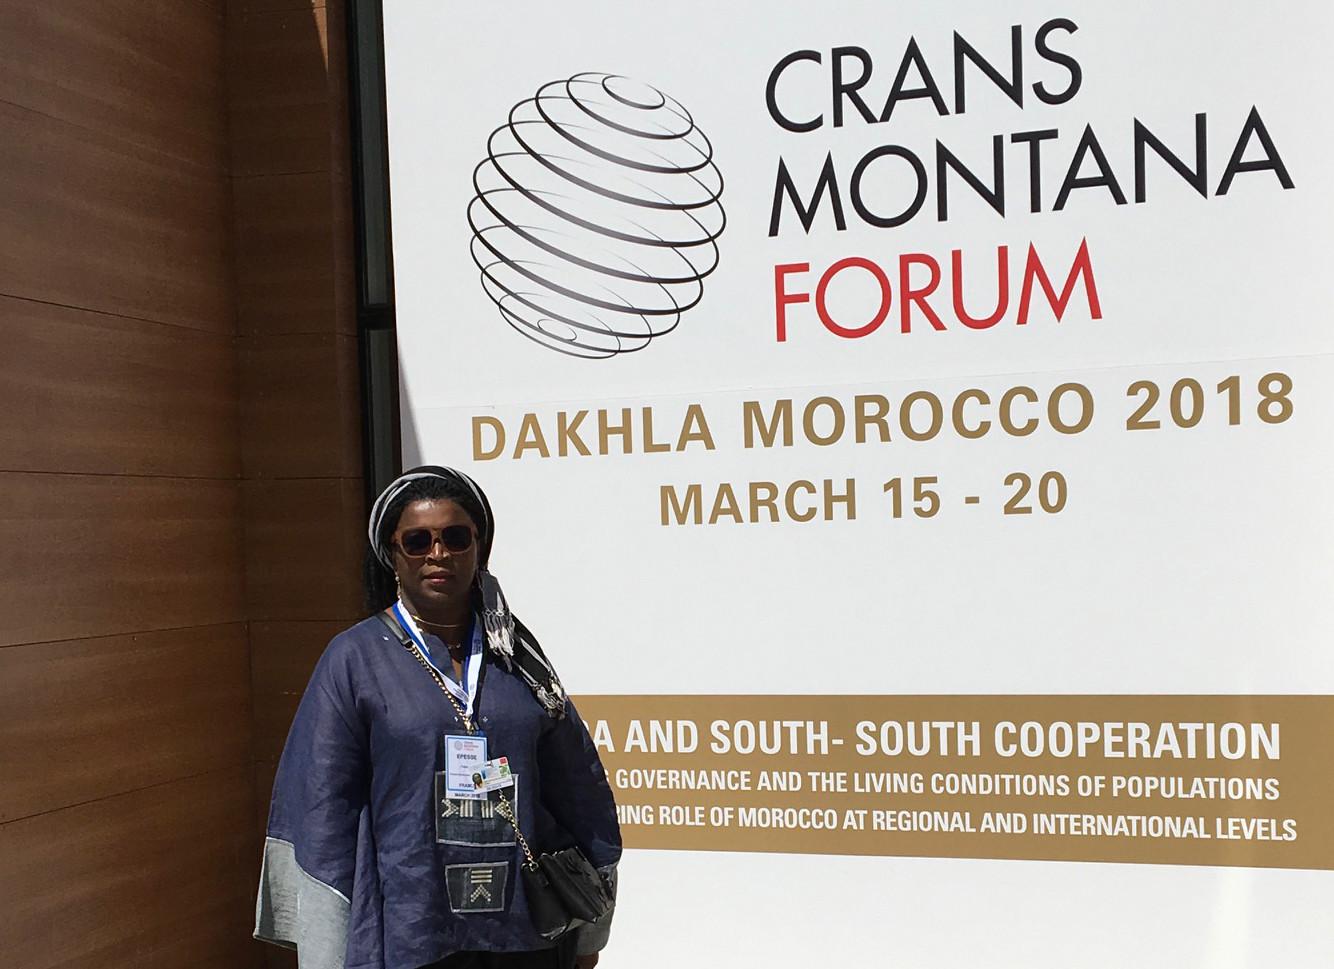 Forum de Crans Montana 2018 Dakhla (Maroc) 2018